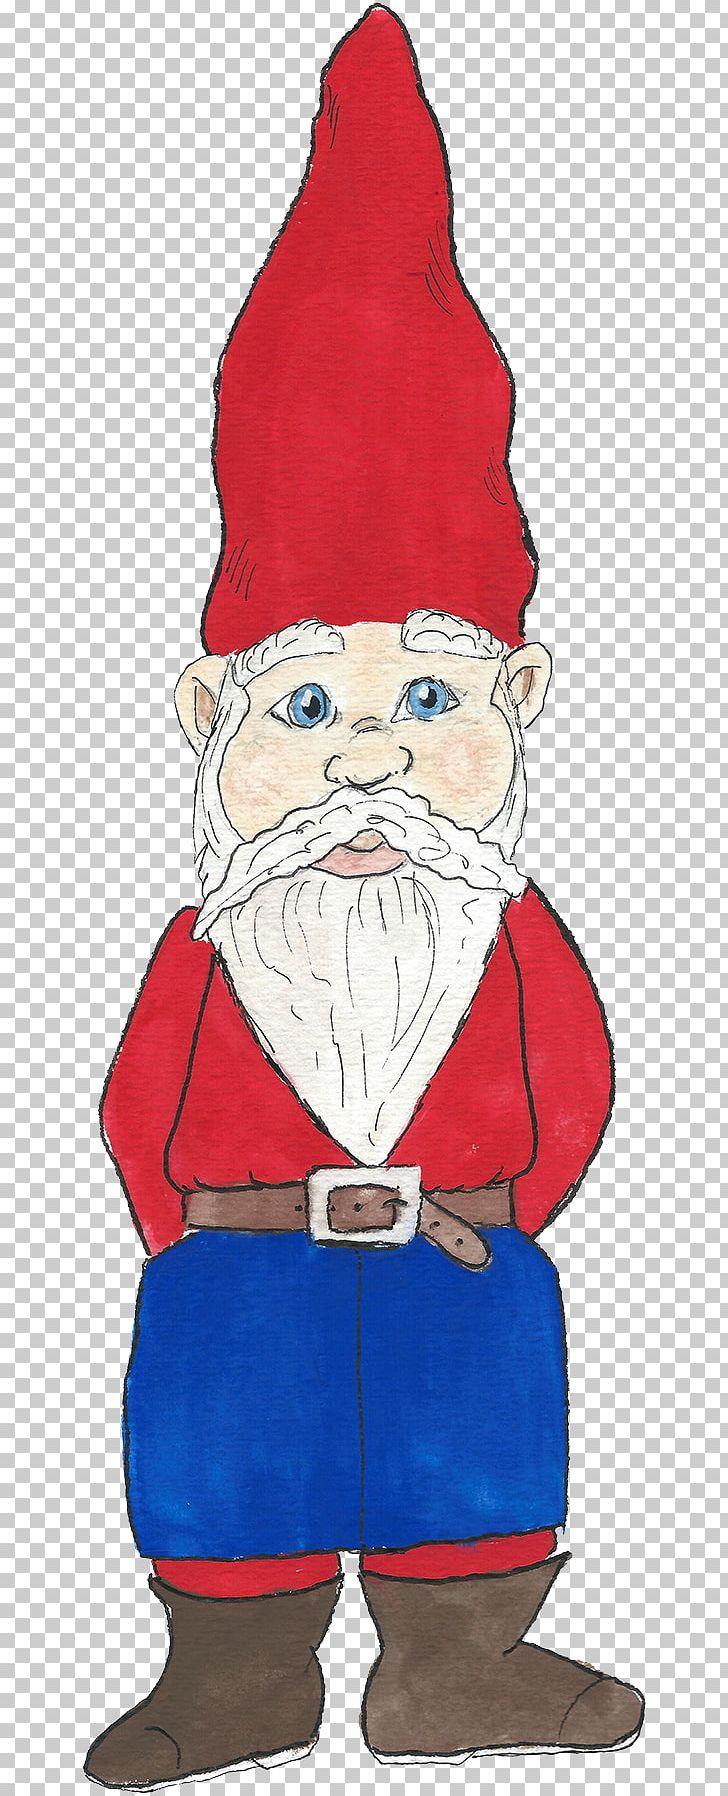 Christmas Gnomes Clipart.Santa Claus Christmas Ornament Garden Gnome Png Clipart